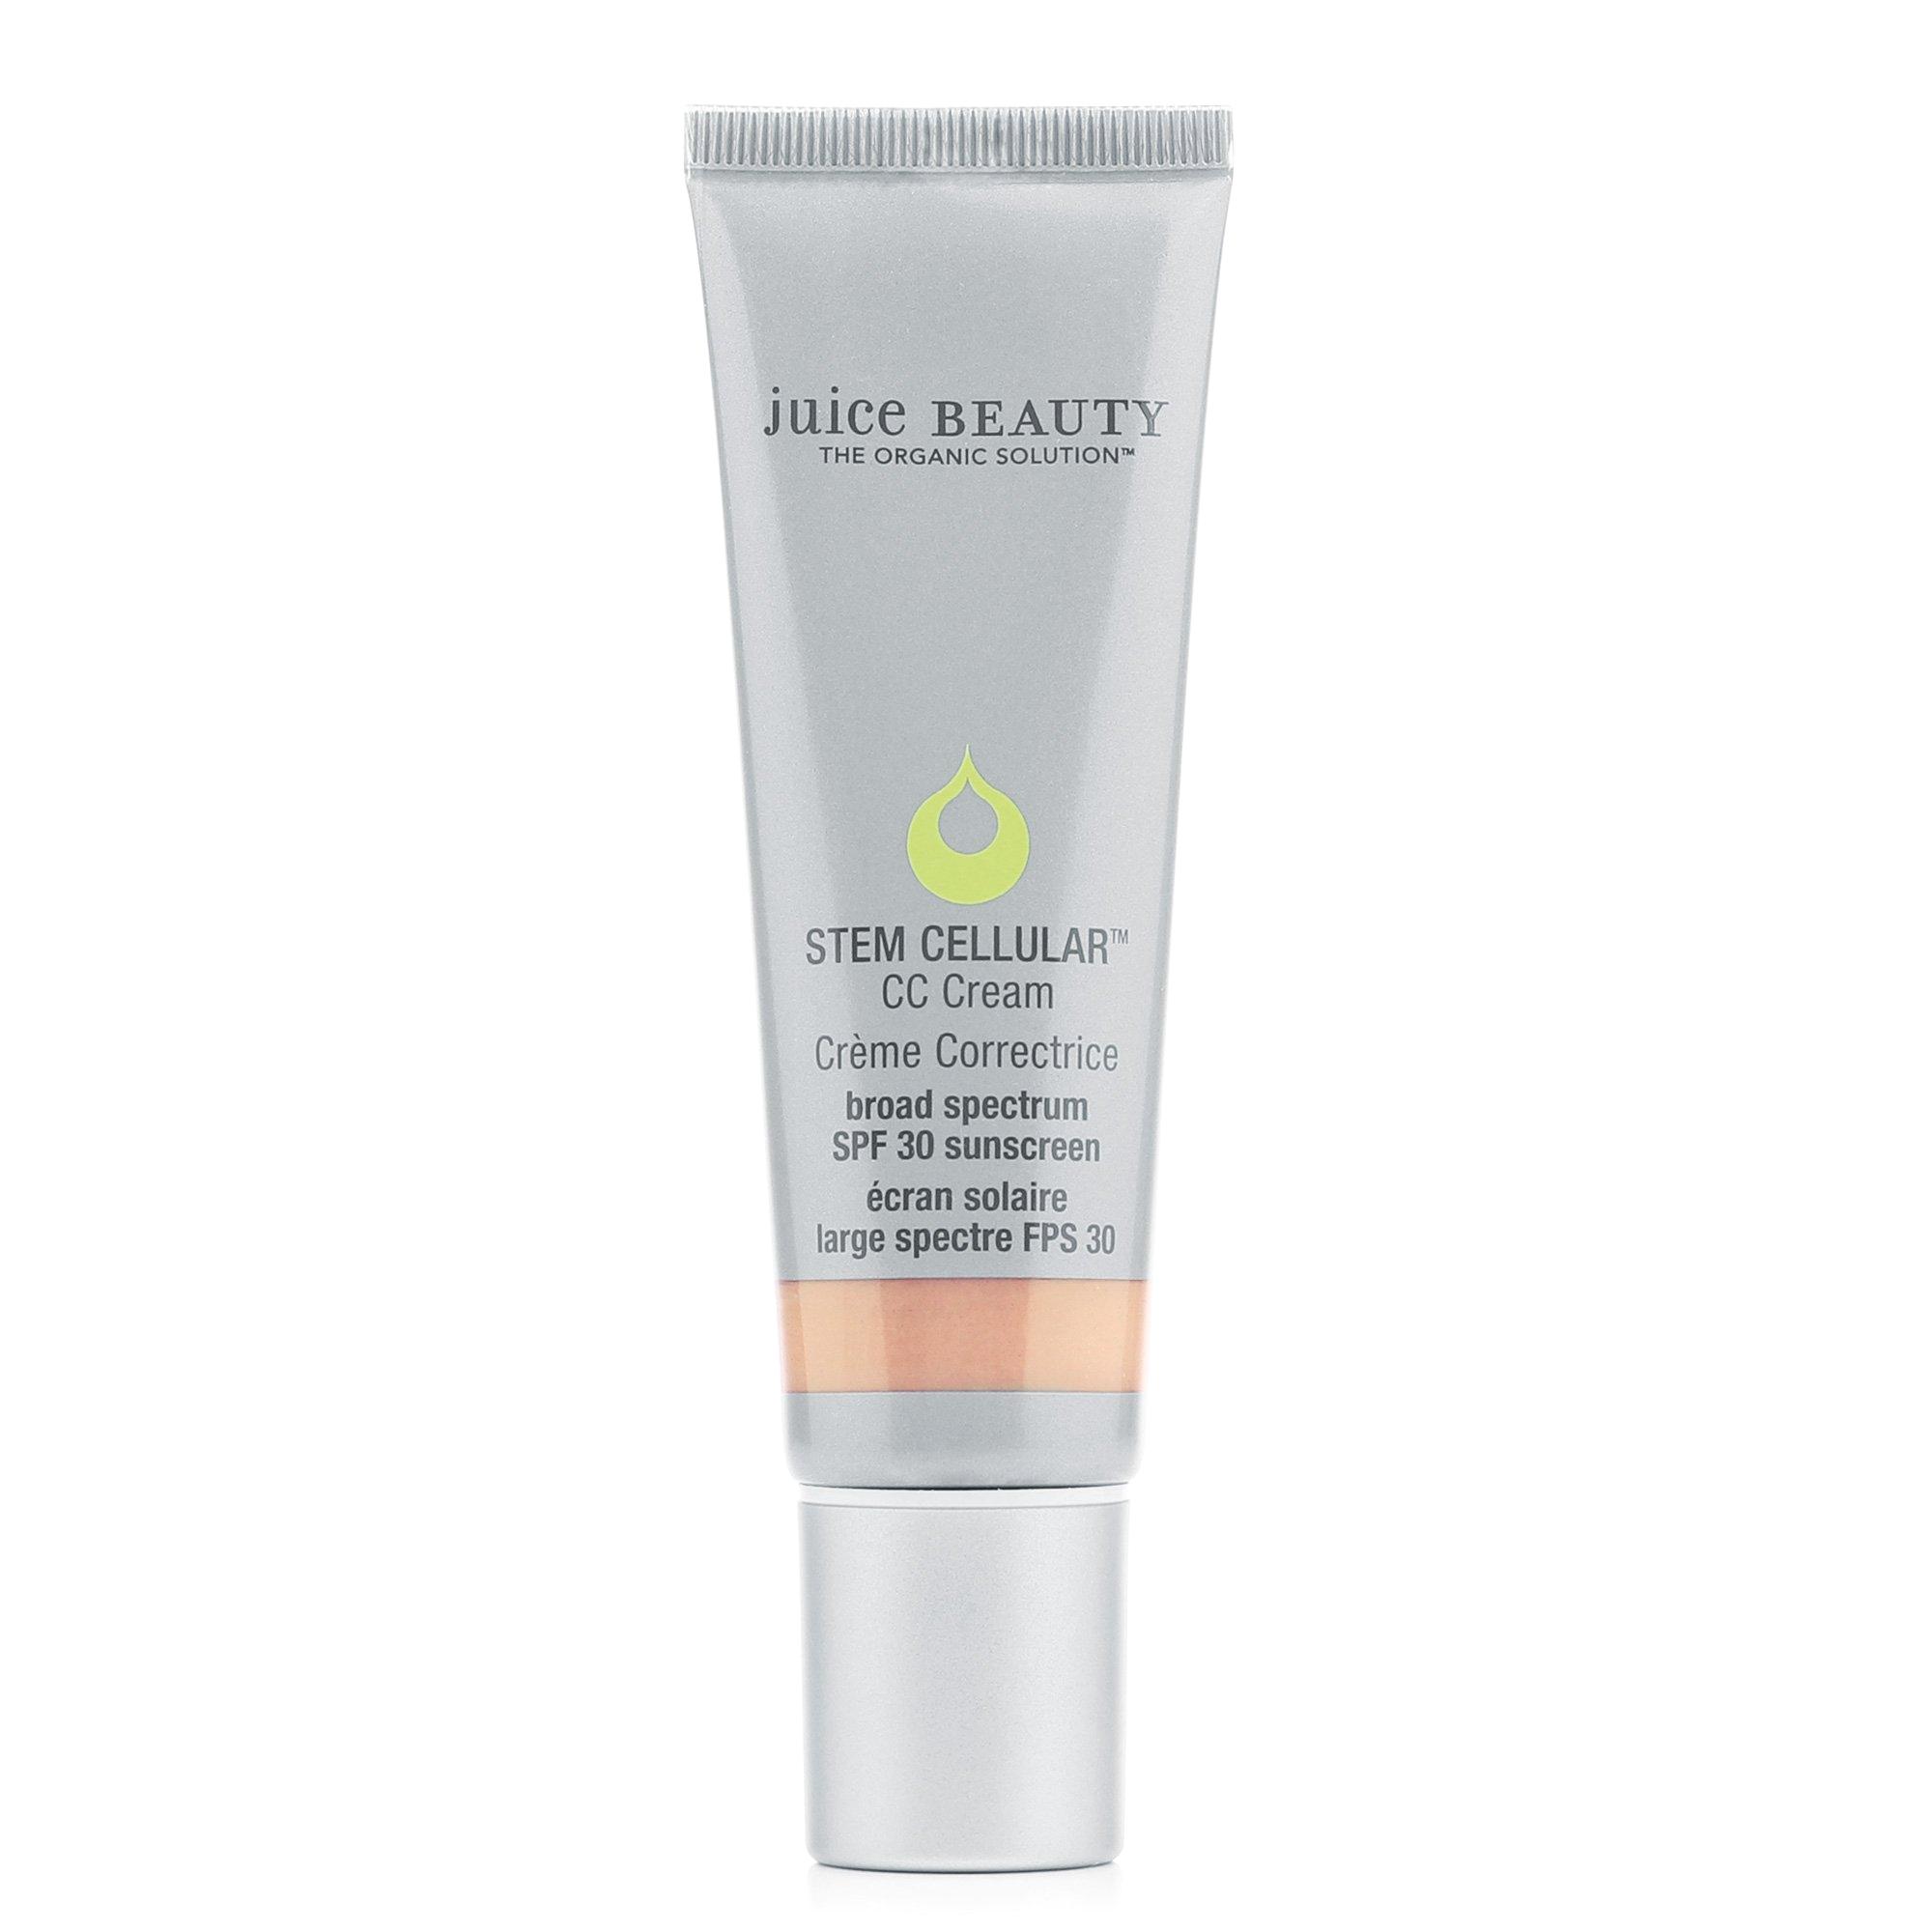 juice beauty stem cellular cc cream 1 7 fl oz